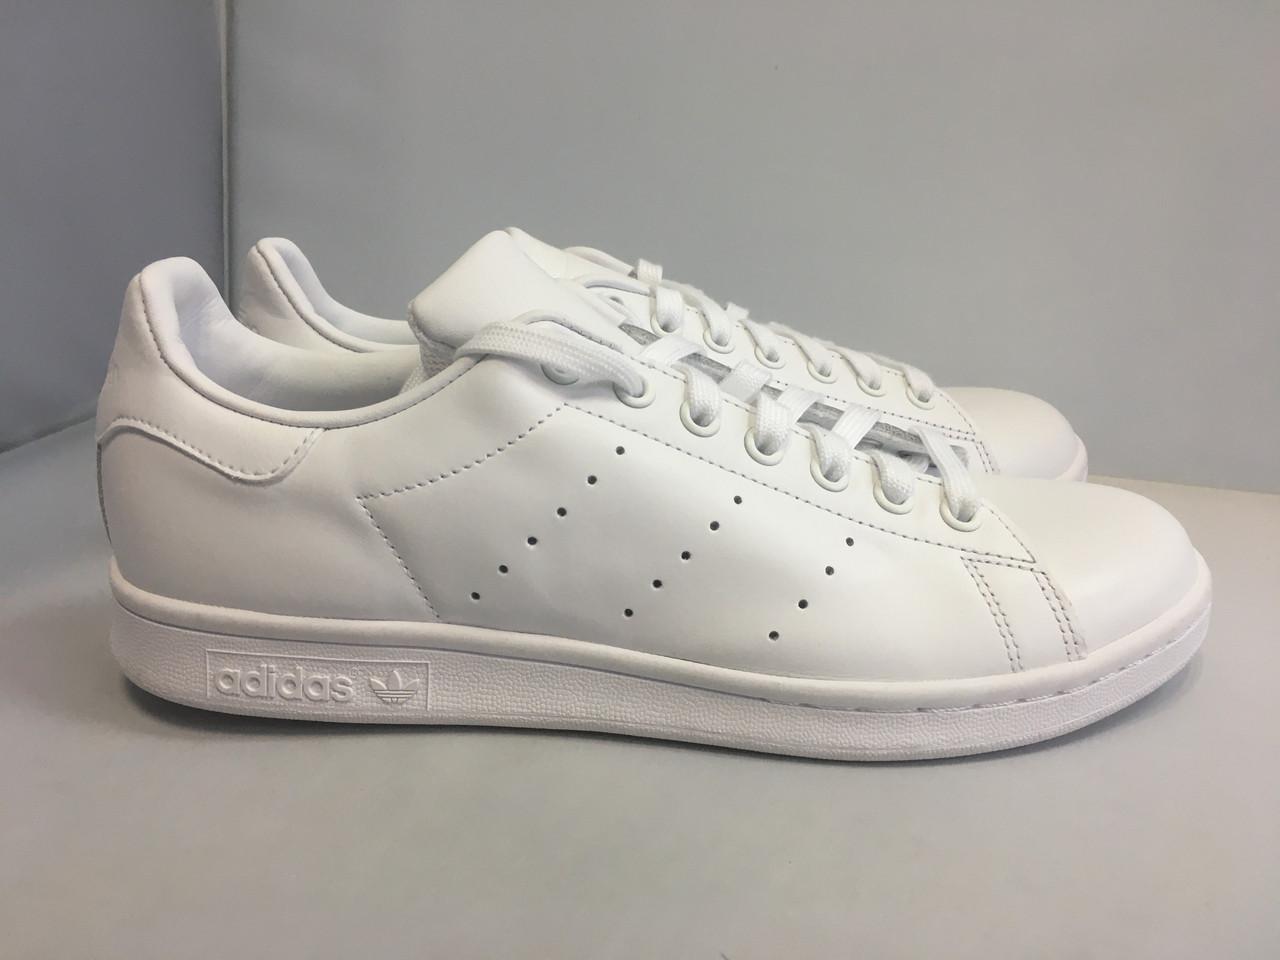 Кроссовки Adidas Stan Smith, 41, 42 размер